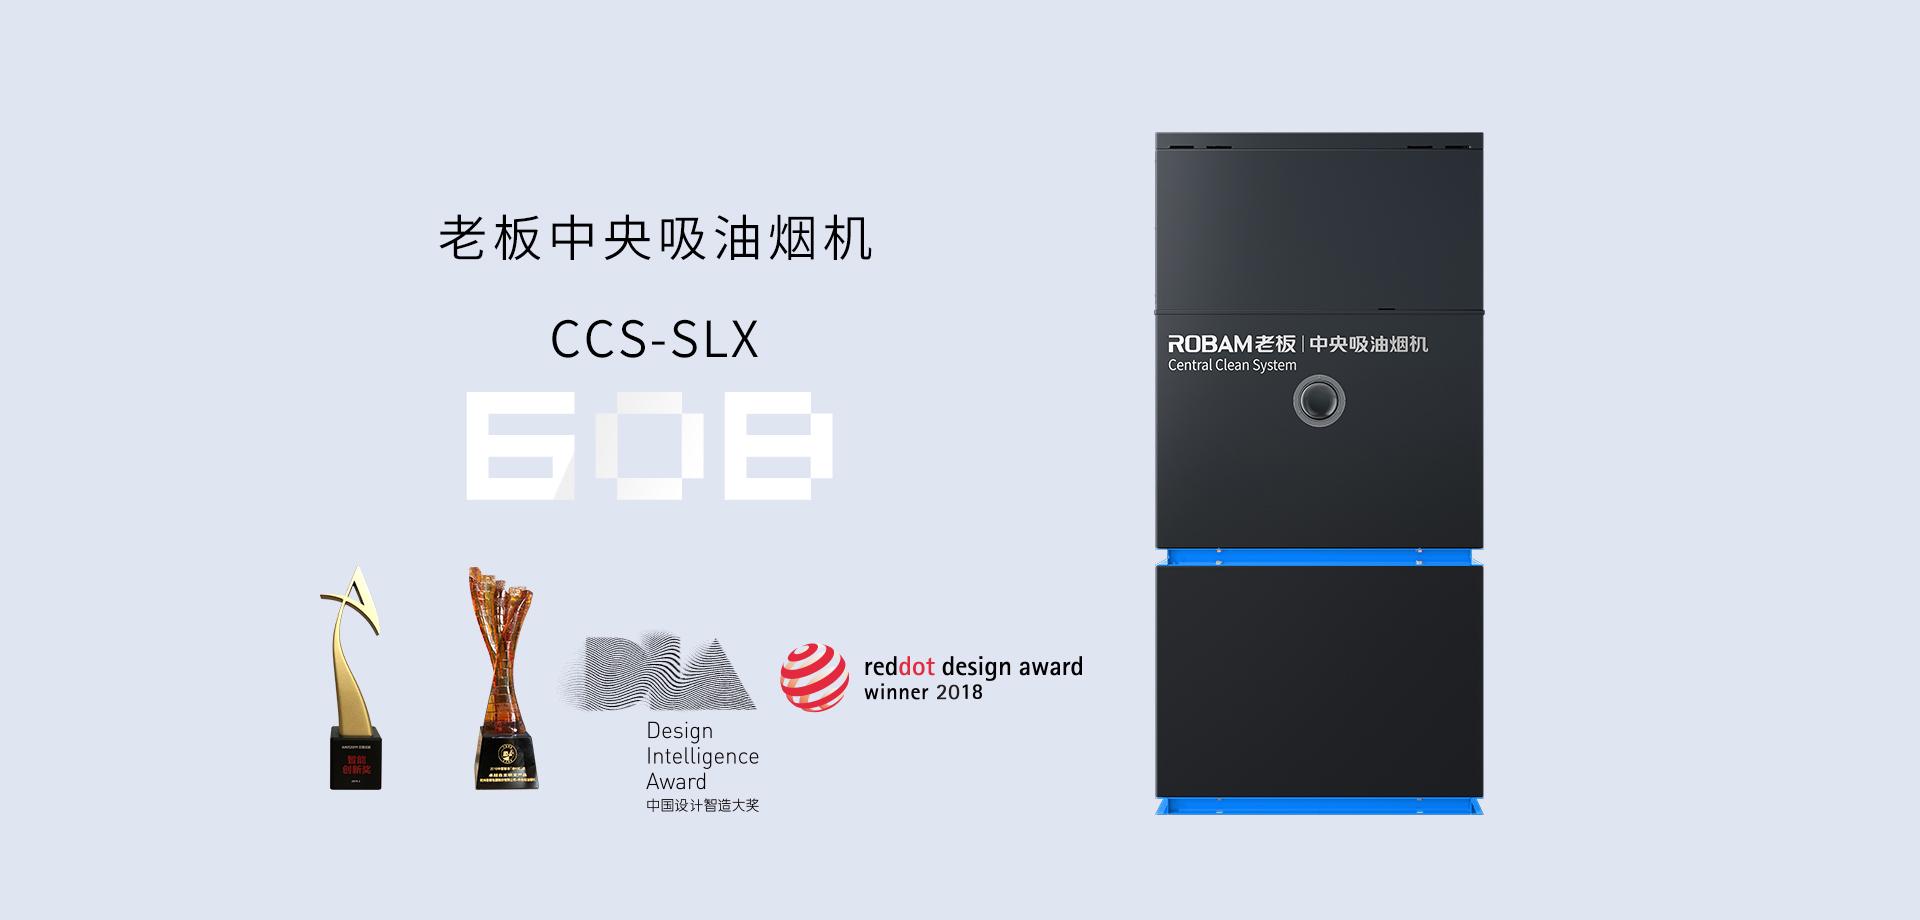 CCS-SLX-60B-详情页-PC端-190627_01.jpg